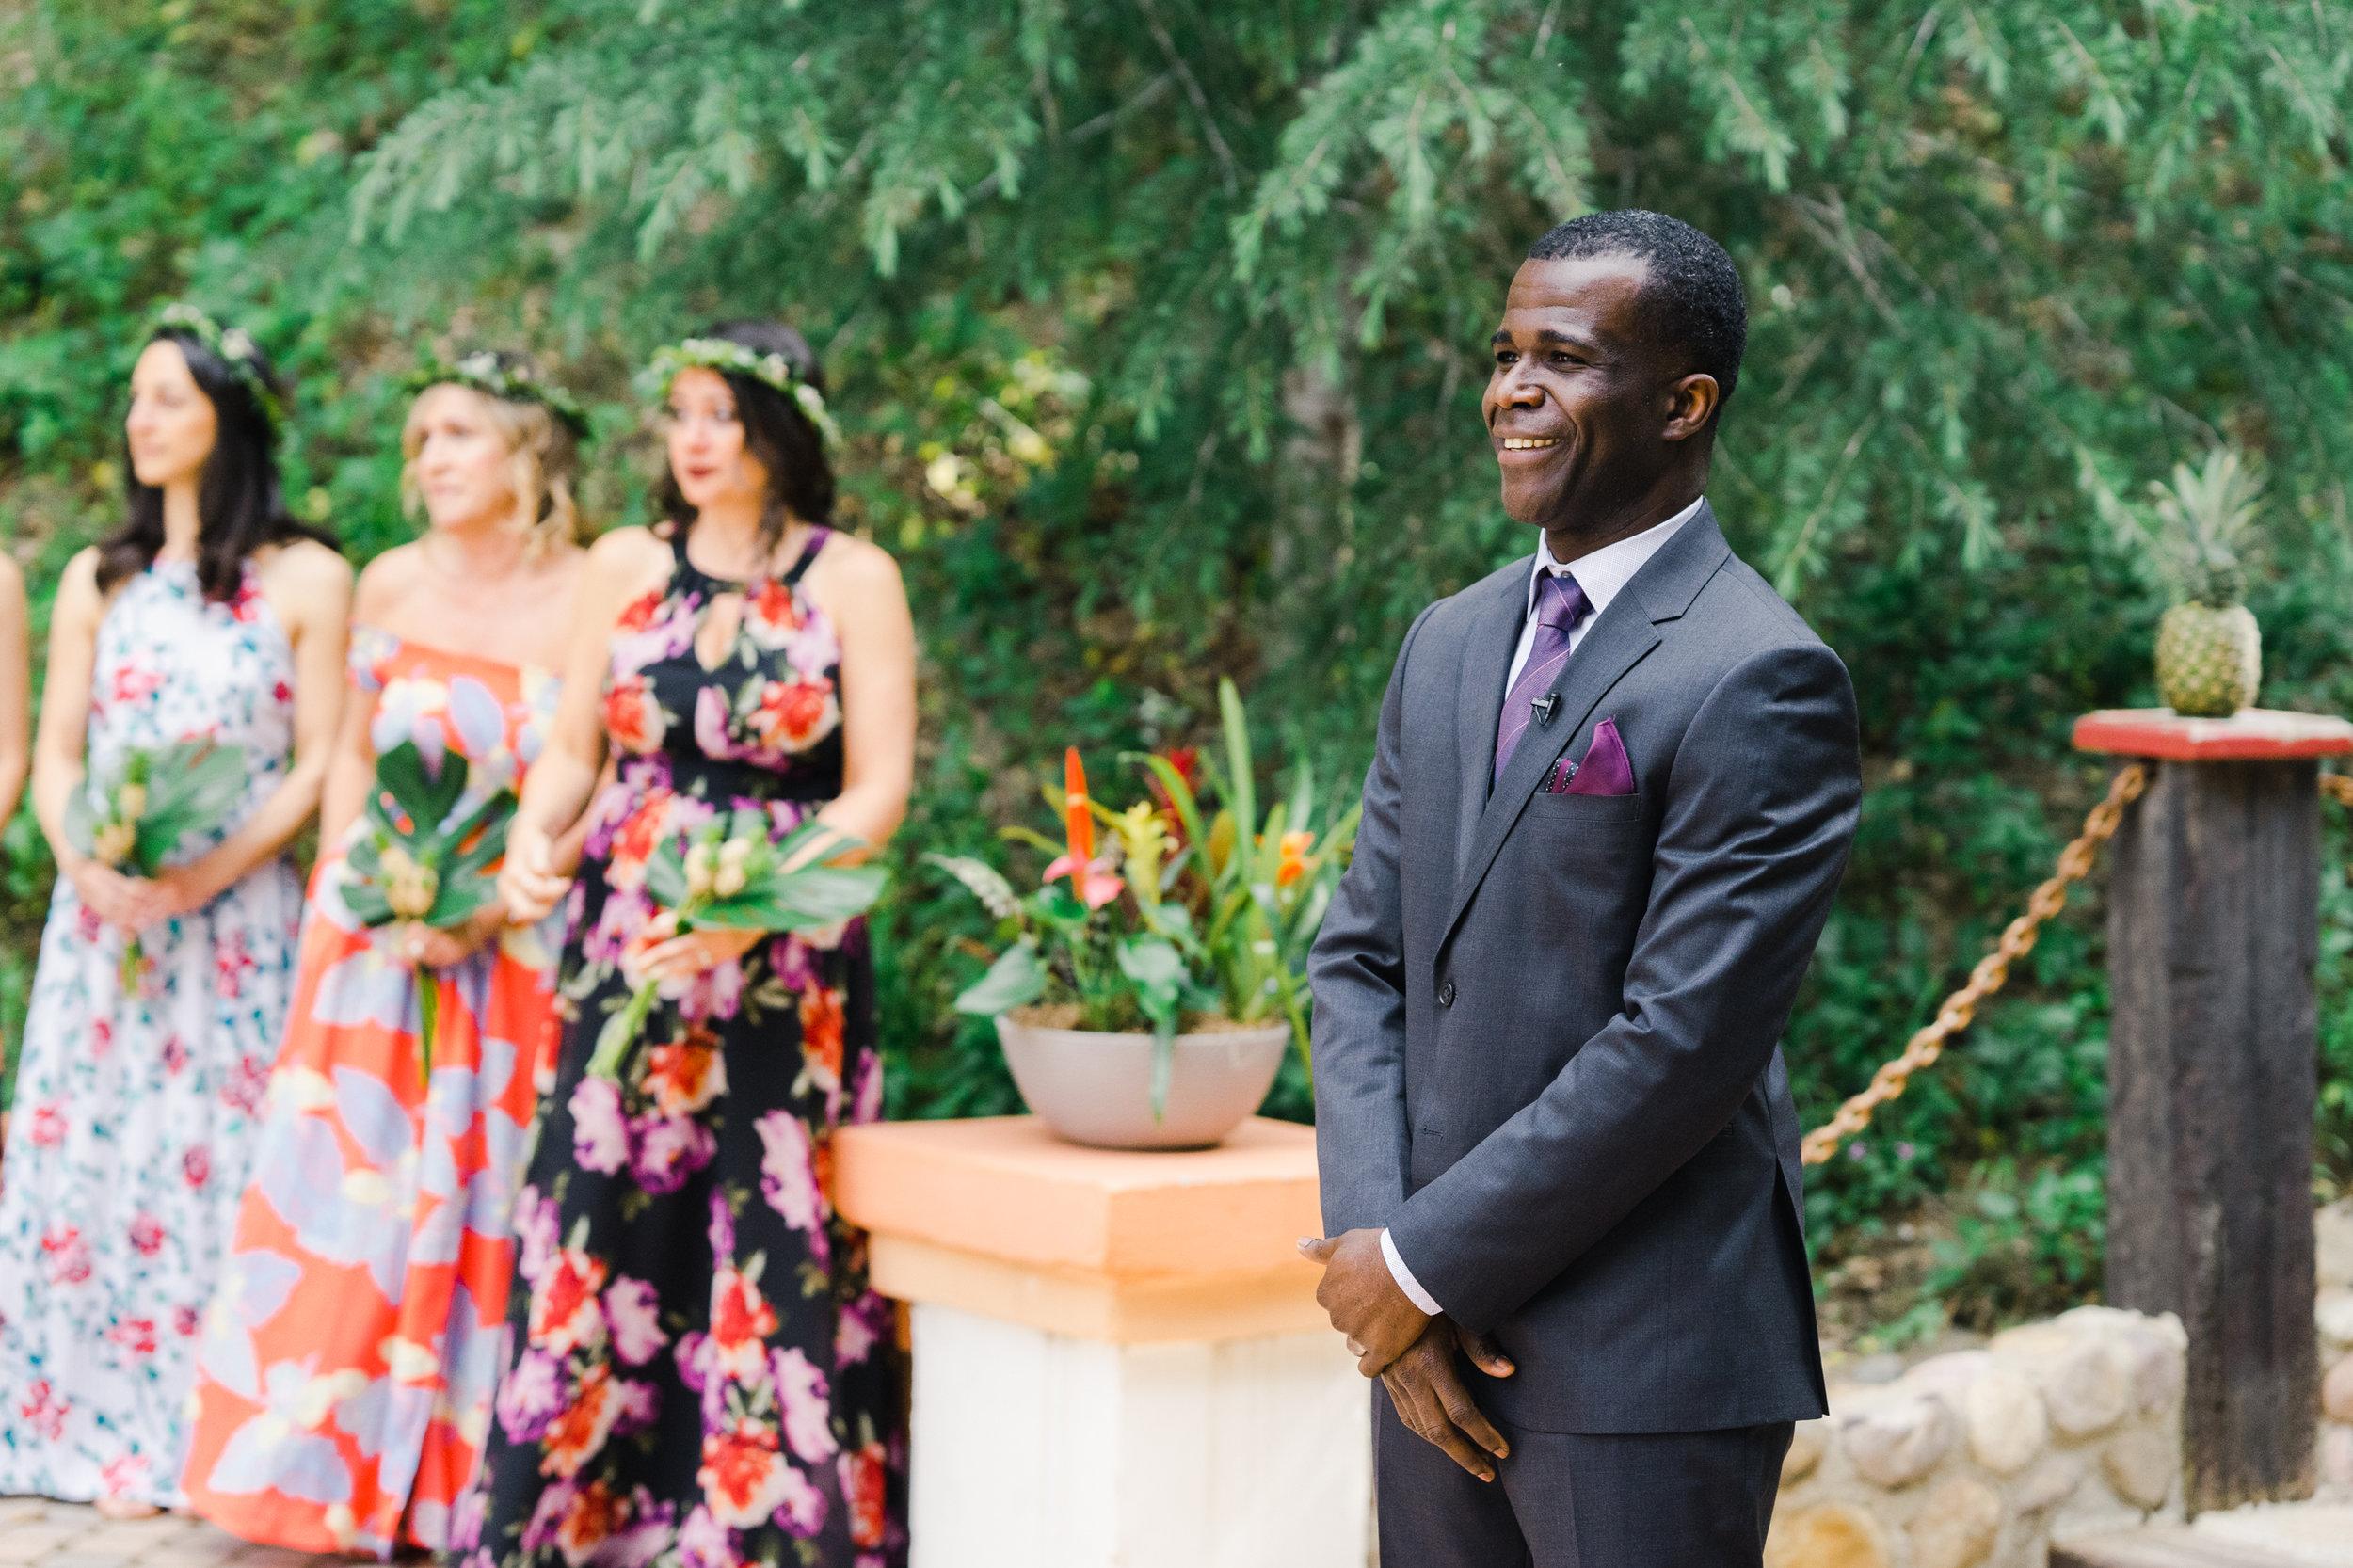 rancho-las-lomas-wedding-kelsey-sim_0111.JPG